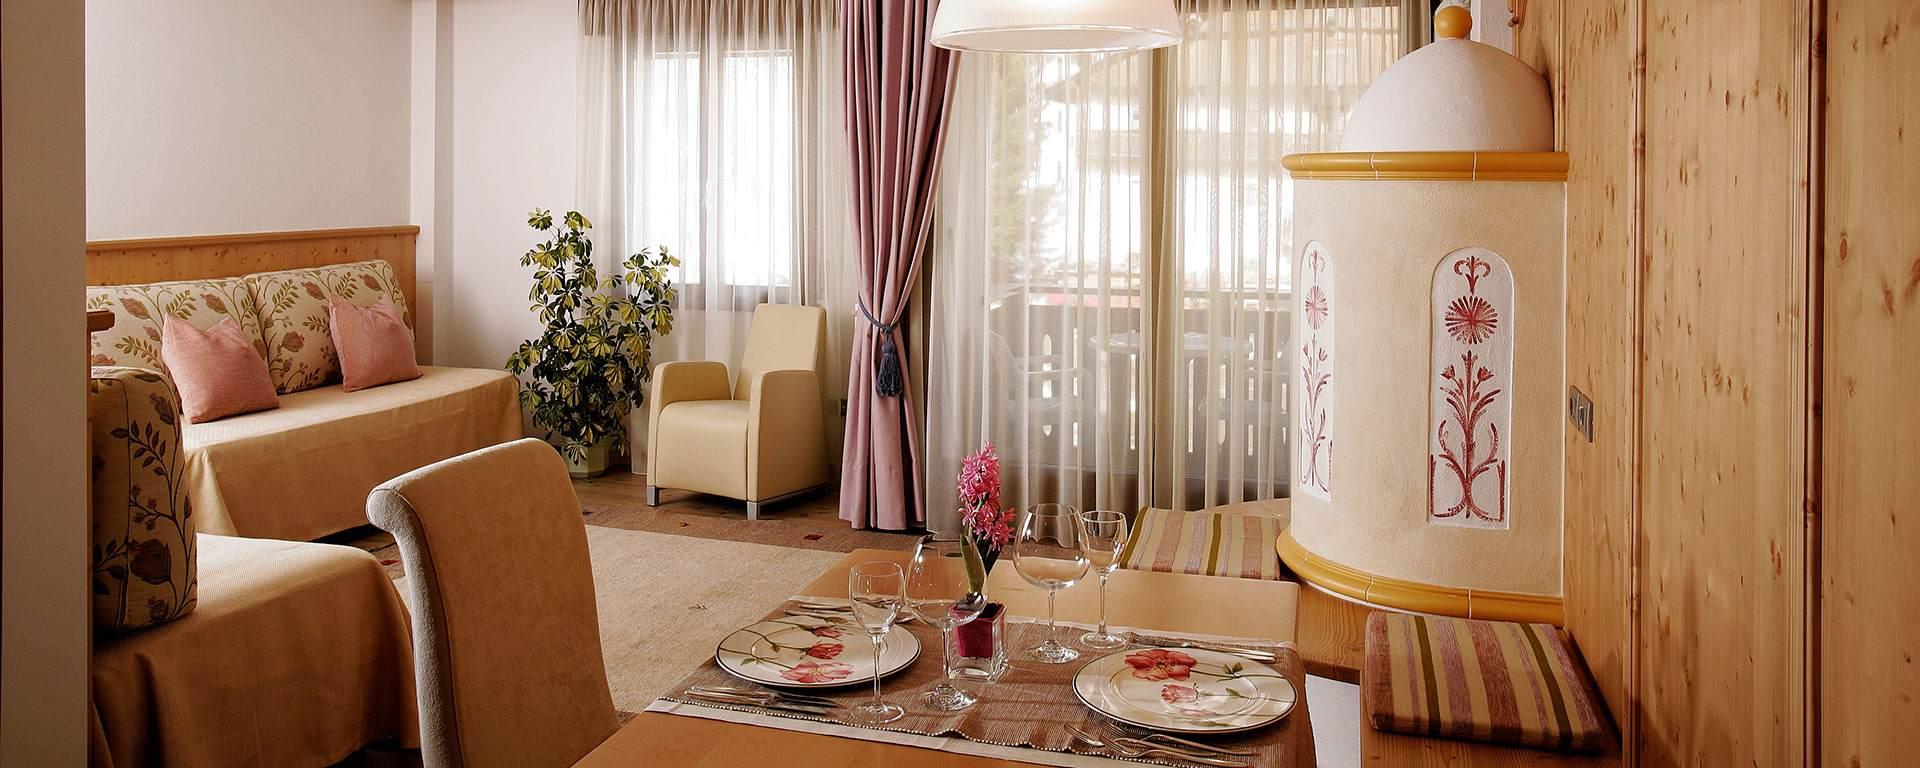 s-apartments